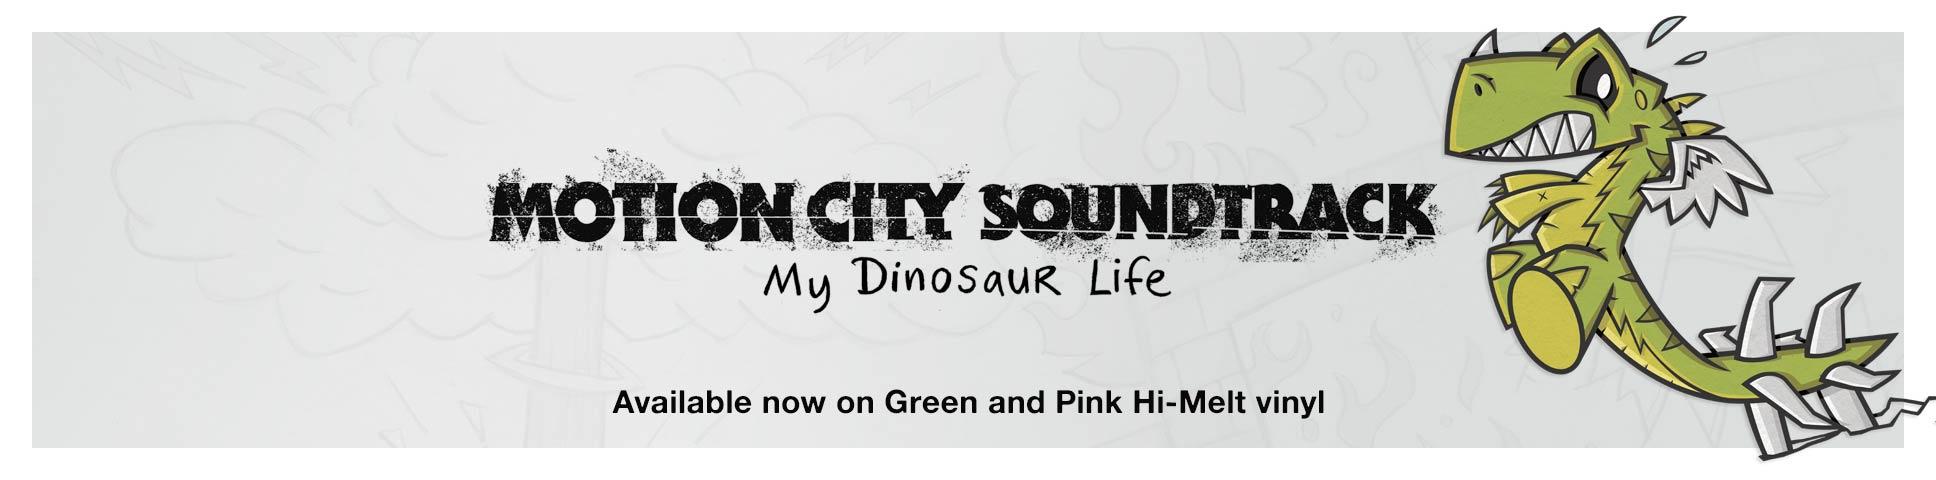 Srcvinyl Vinyl Record Store